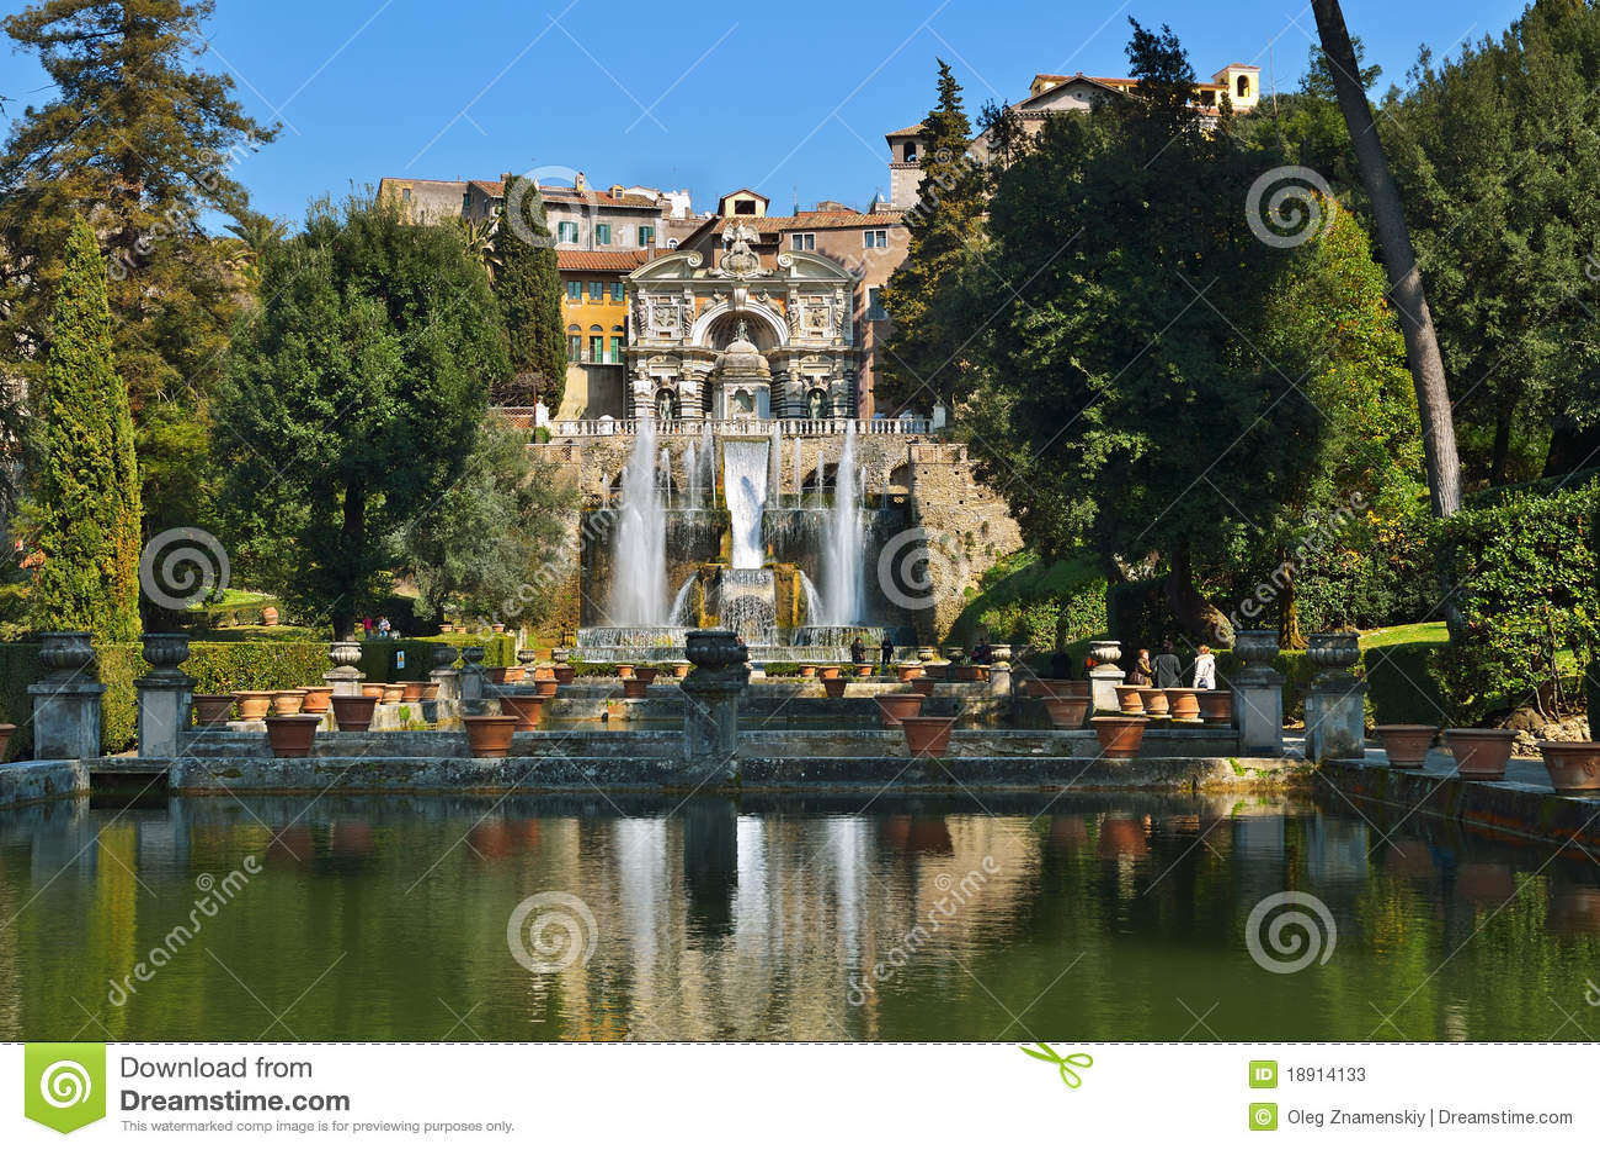 Tivoli italie jardin regroupement et fontaine image for Jardin tivoli